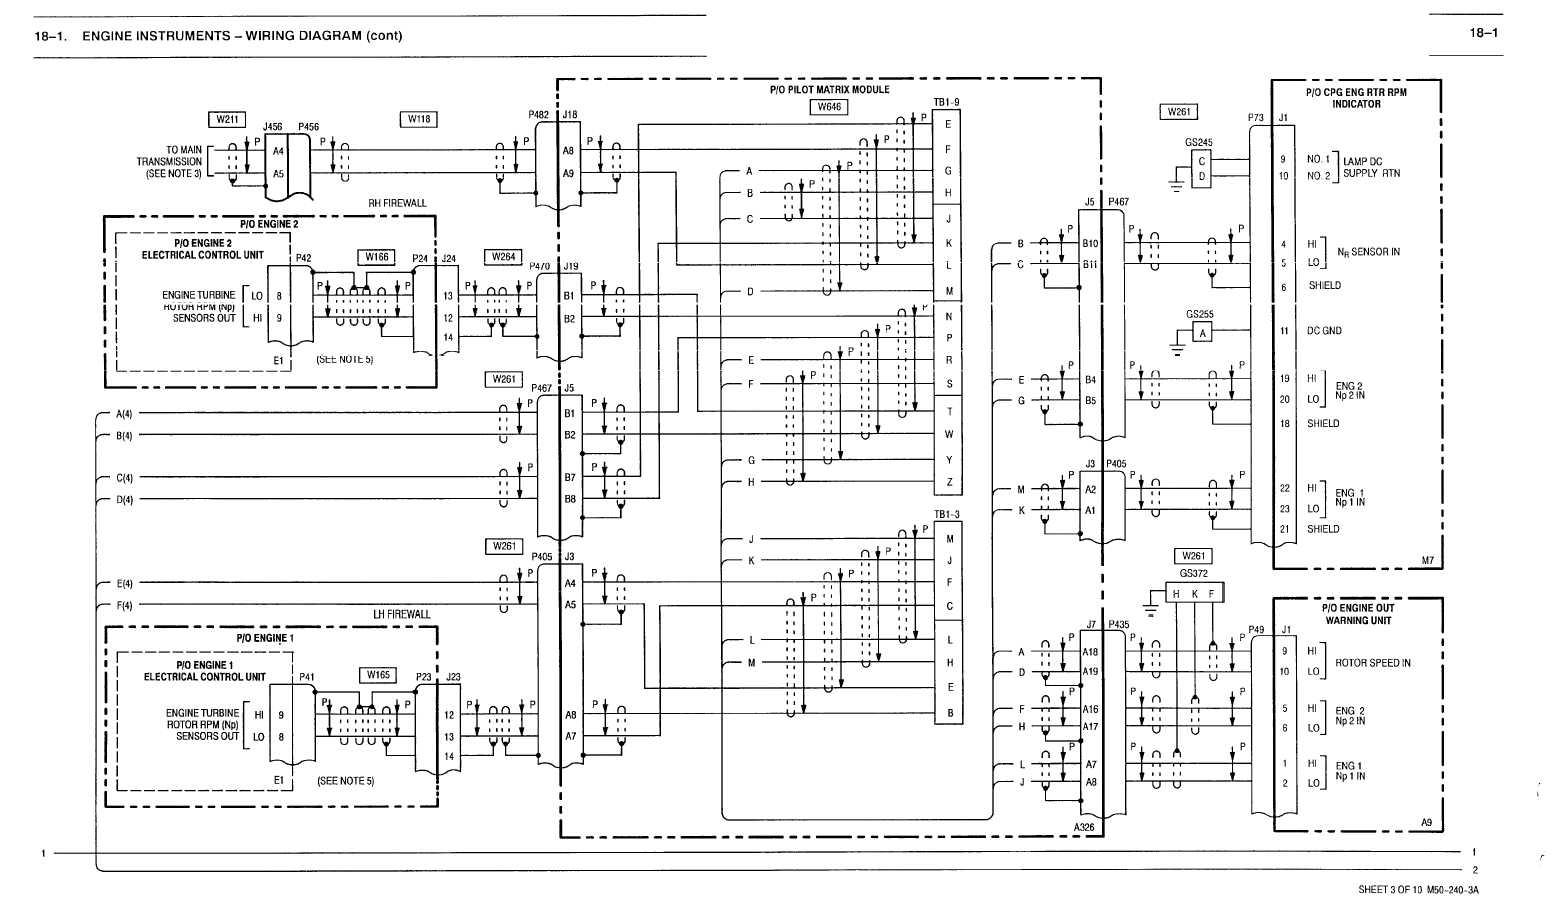 18 1 Engine Instruments Wiring Diagram Cont